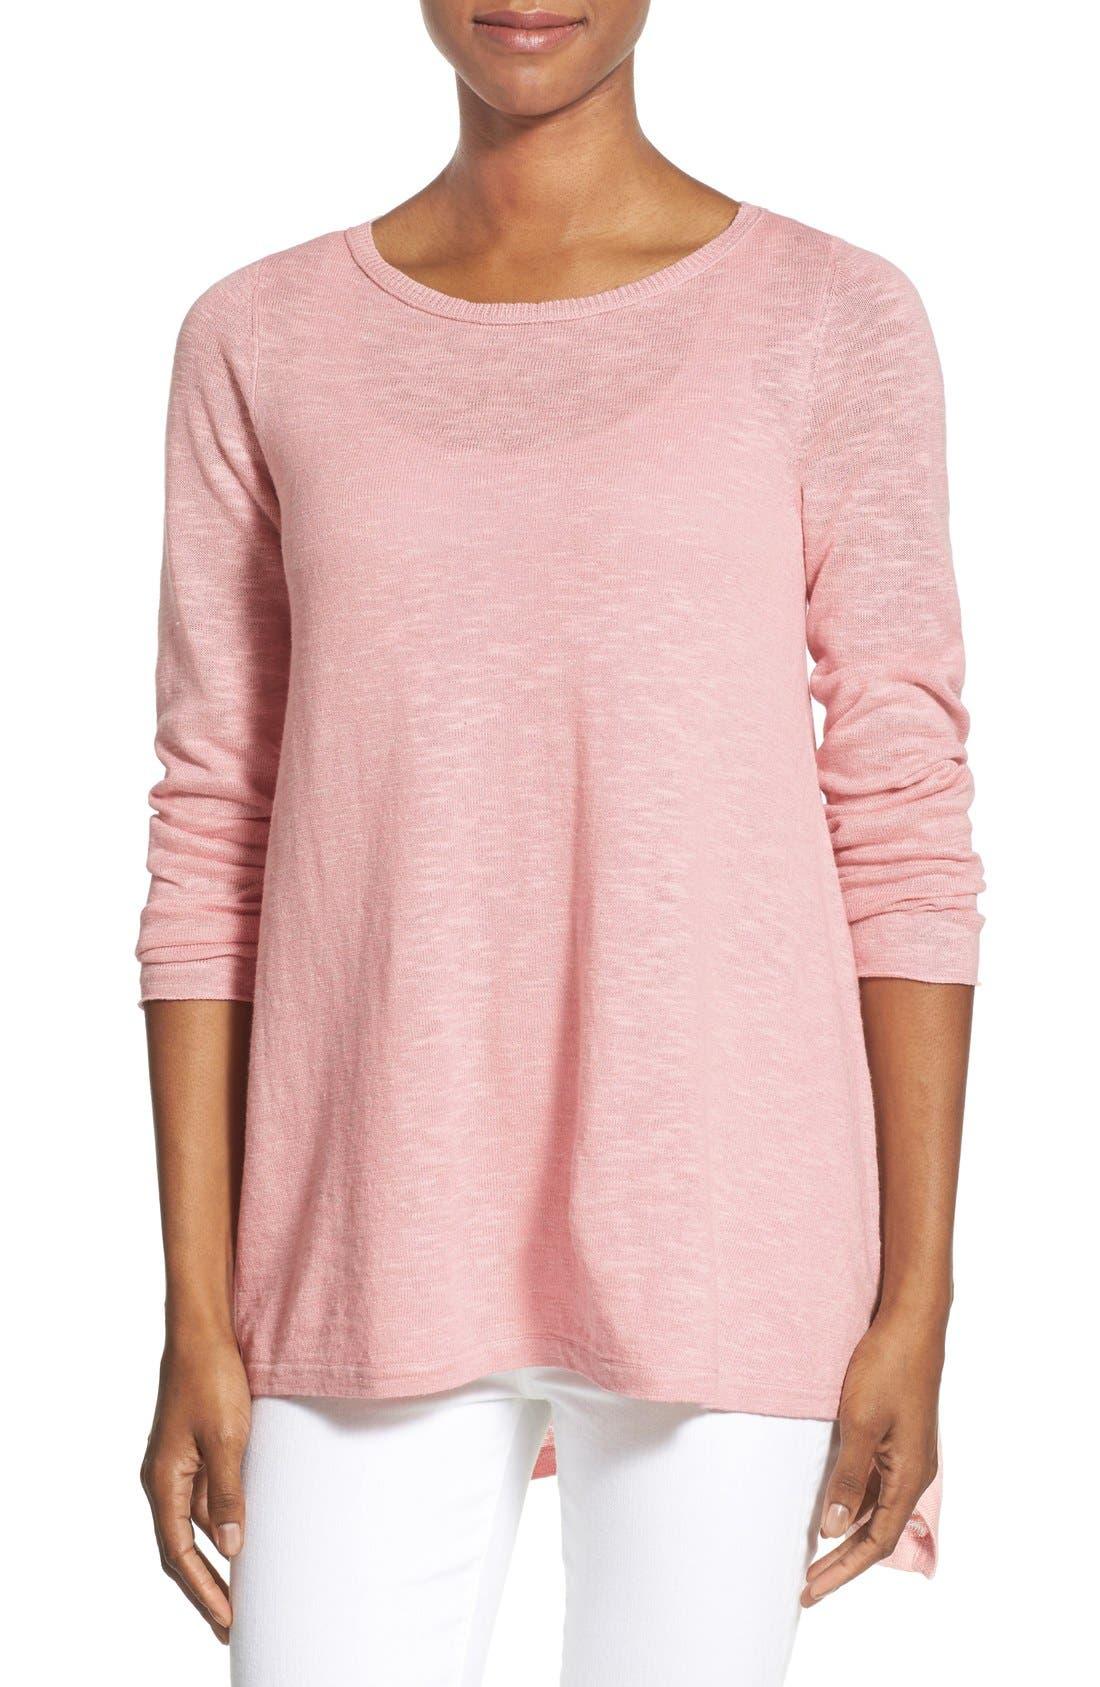 Alternate Image 1 Selected - Eileen Fisher Organic Linen & Cotton Bateau Neck Sweater (Regular & Petite)